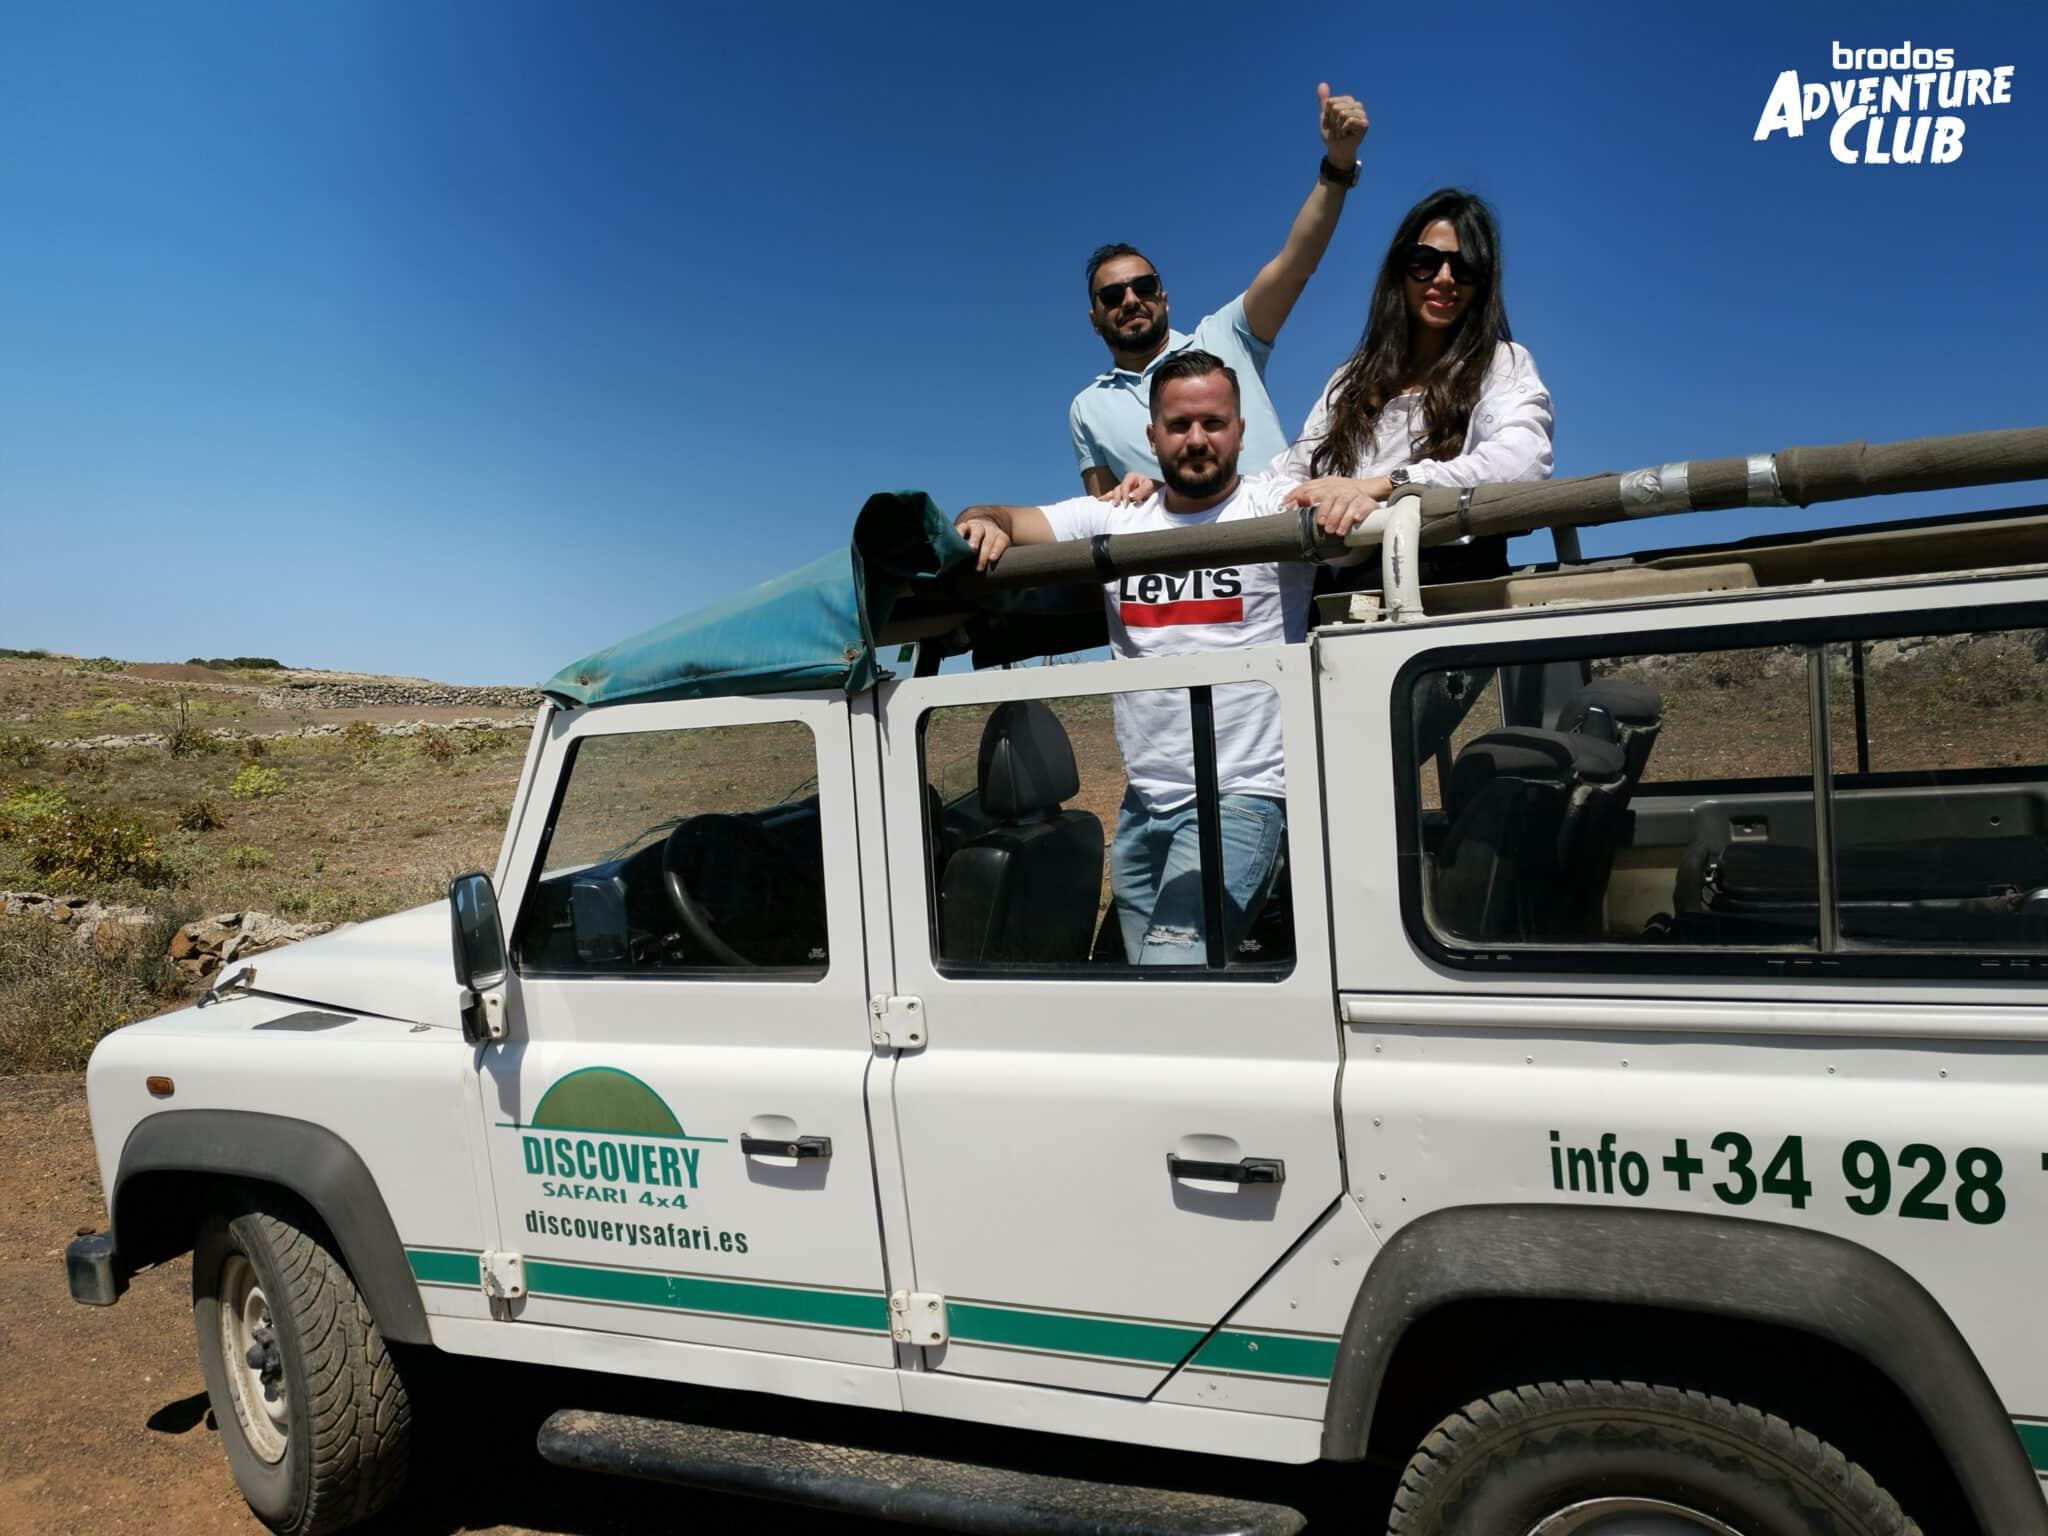 Brodos Adventure Club. Fuerteventura Abenteuer